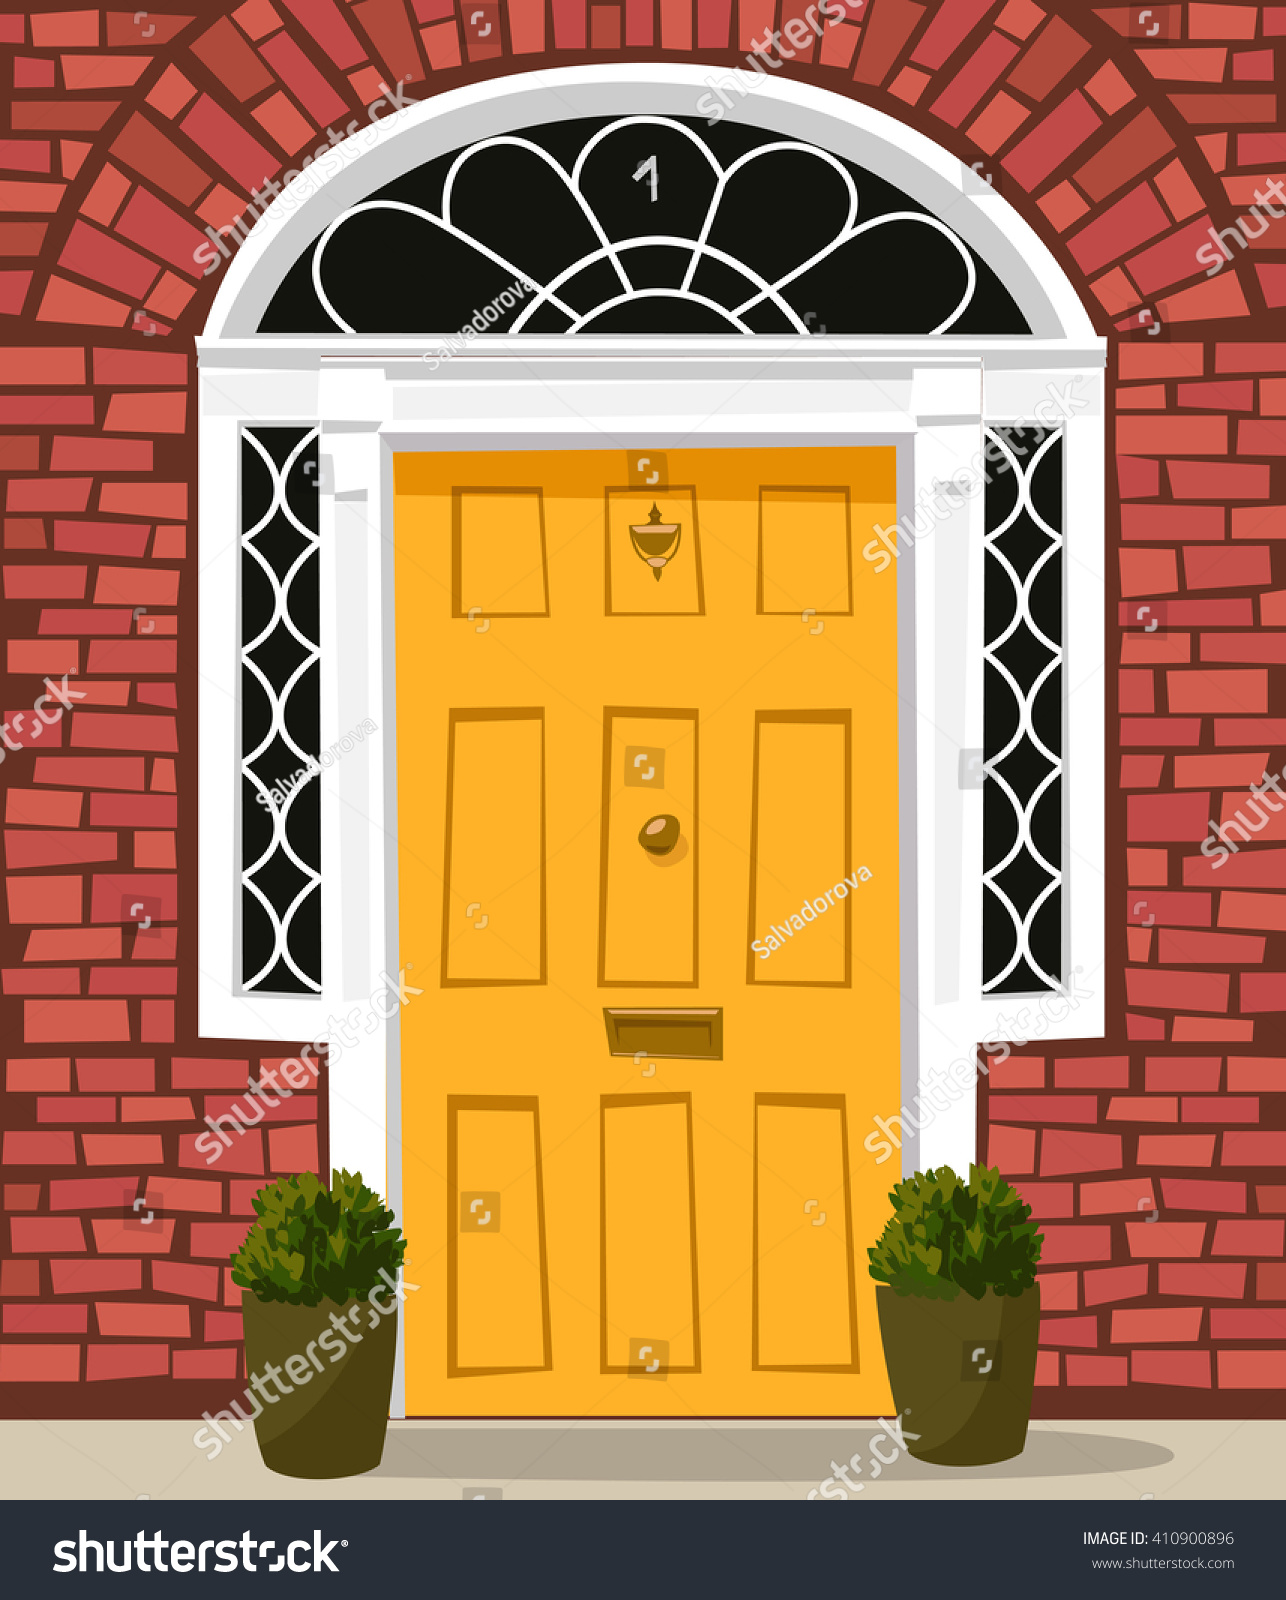 Vector De Stock Libre De Regalias Sobre Traditional Yellowpainted Front Door Letterbox Doorknocker410900896